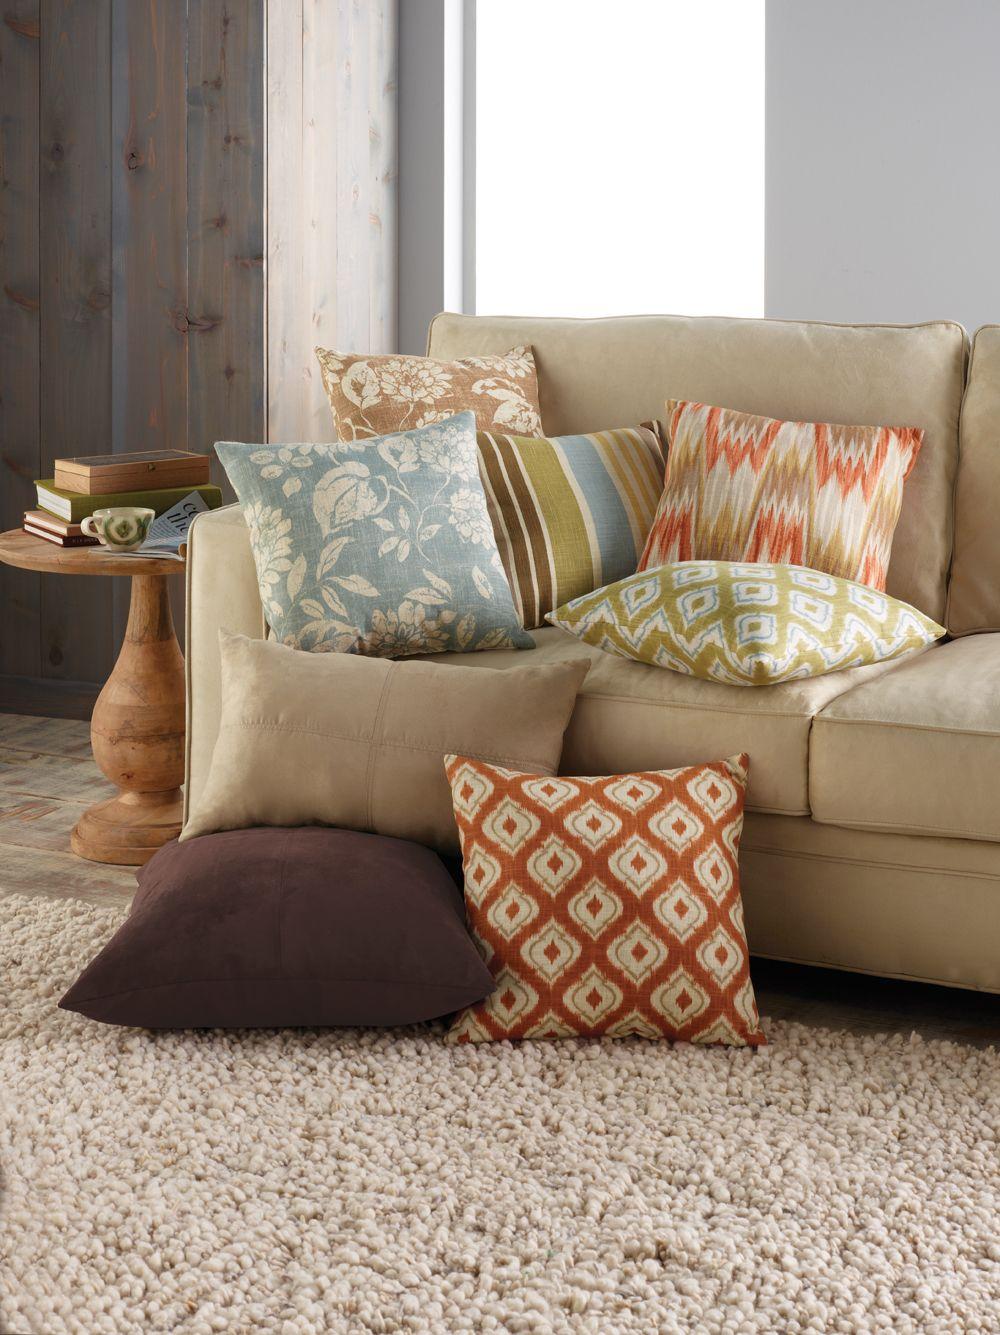 Throw Pillows Home Decor Furniture Decor Kohl S Living